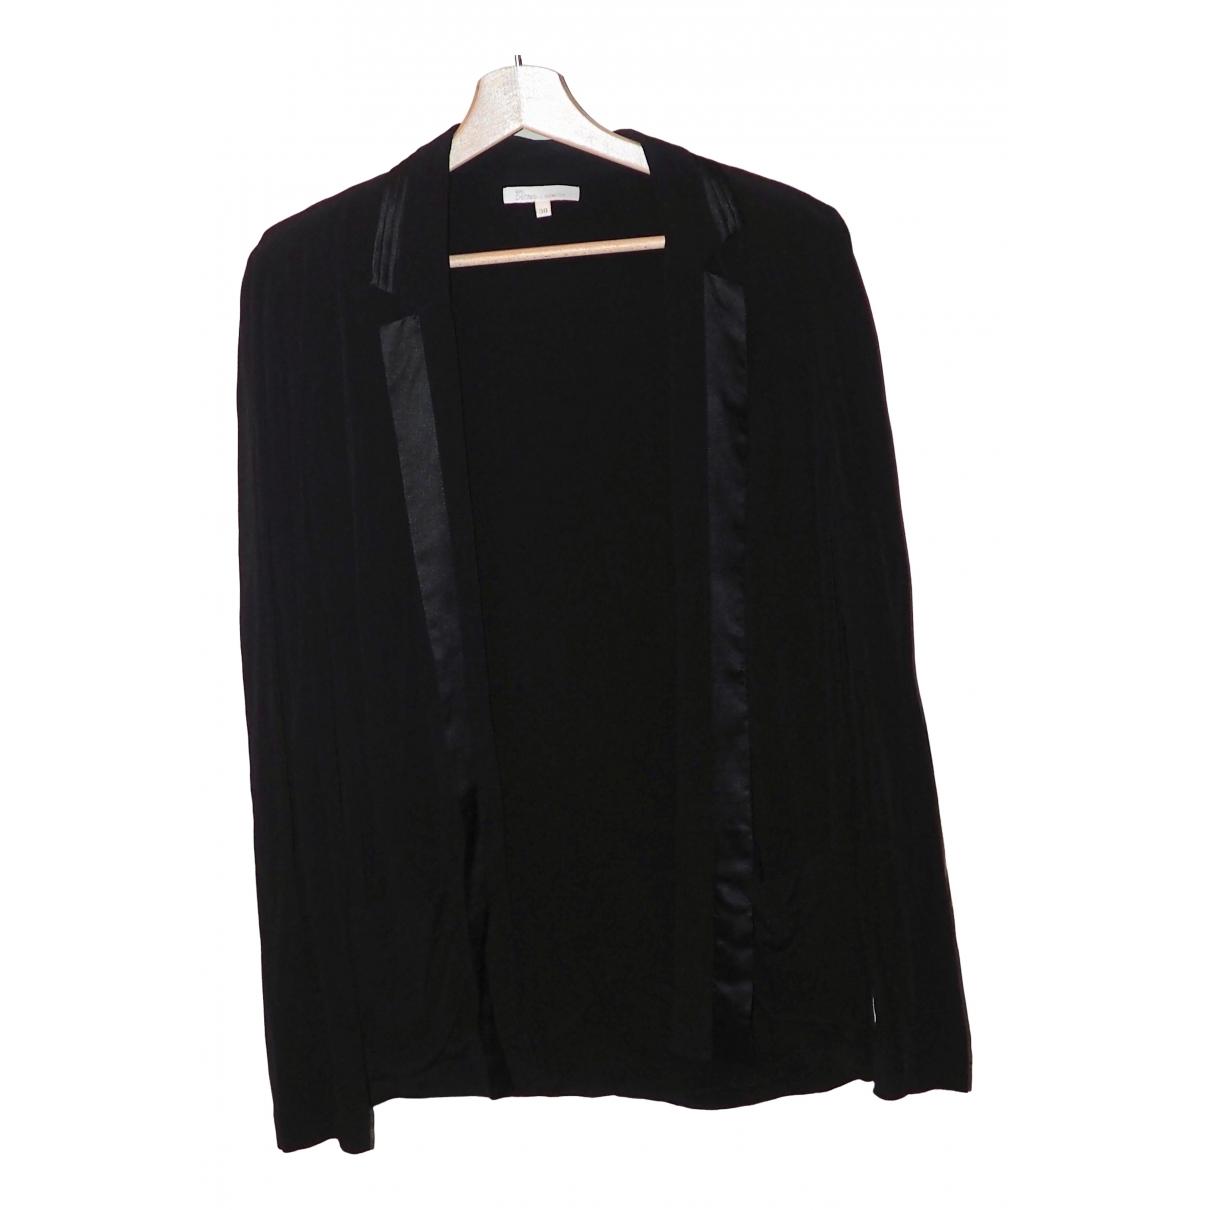 Les Petites \N Black jacket for Women 38 FR